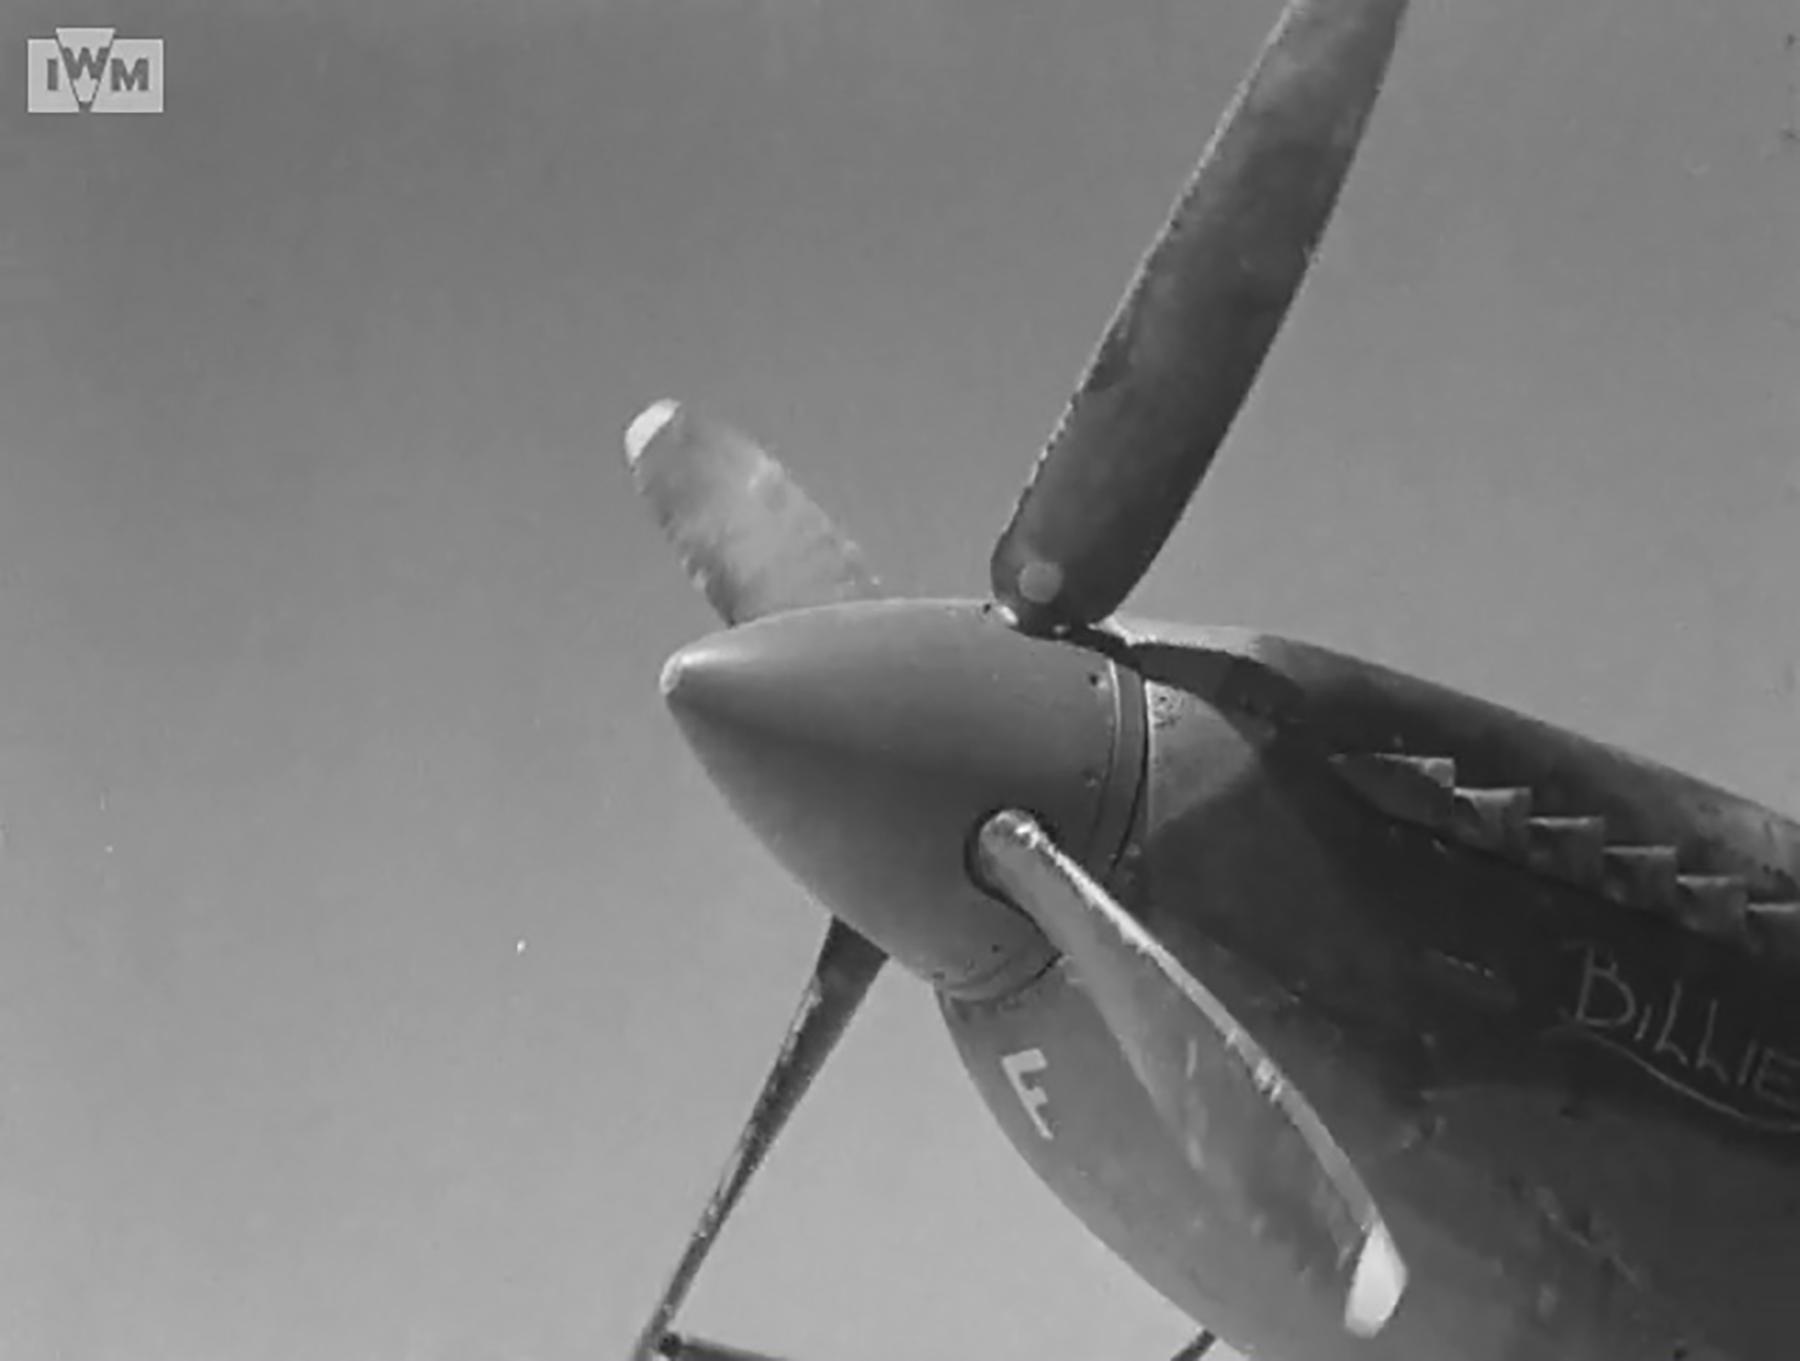 Spitfire VIII RAF 136Sqn HMF Billie at Rumkhapalong operating over Burma CBI 1944 IWM 02